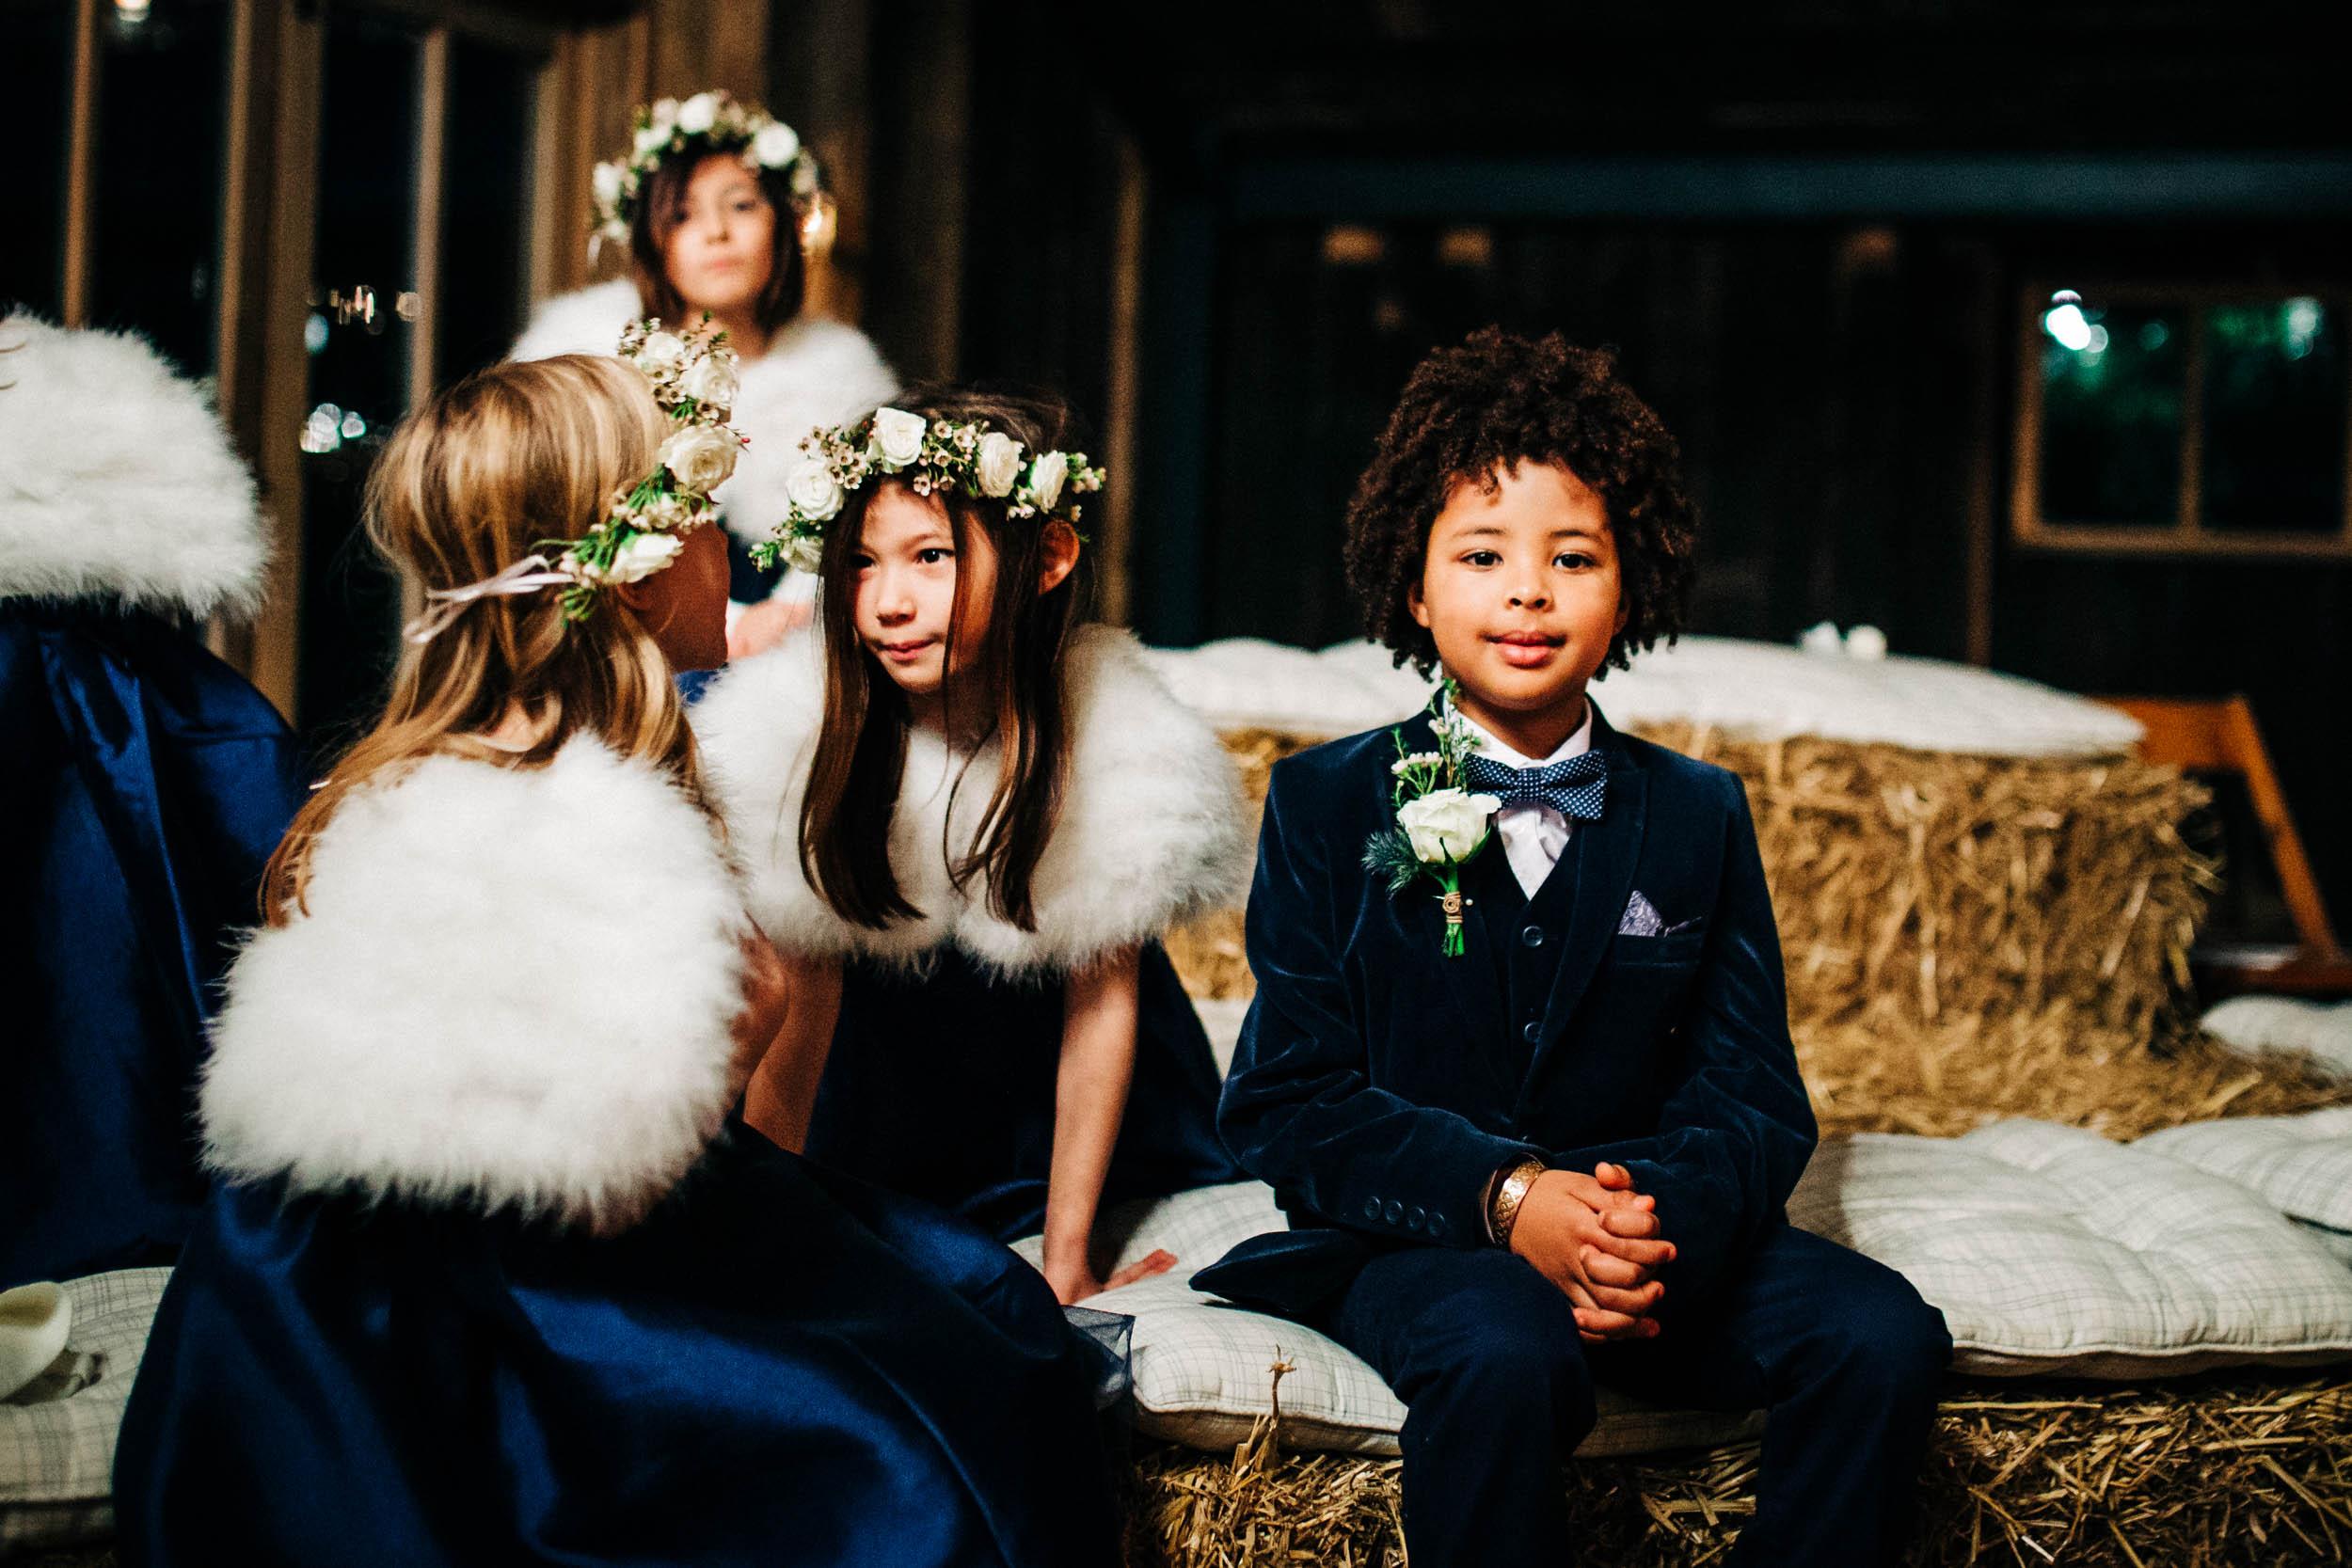 Alex_Sedgmond_Photography-SouthWalesWeddingPhotography-Wedding-Photographer-Cardiff-14.jpg